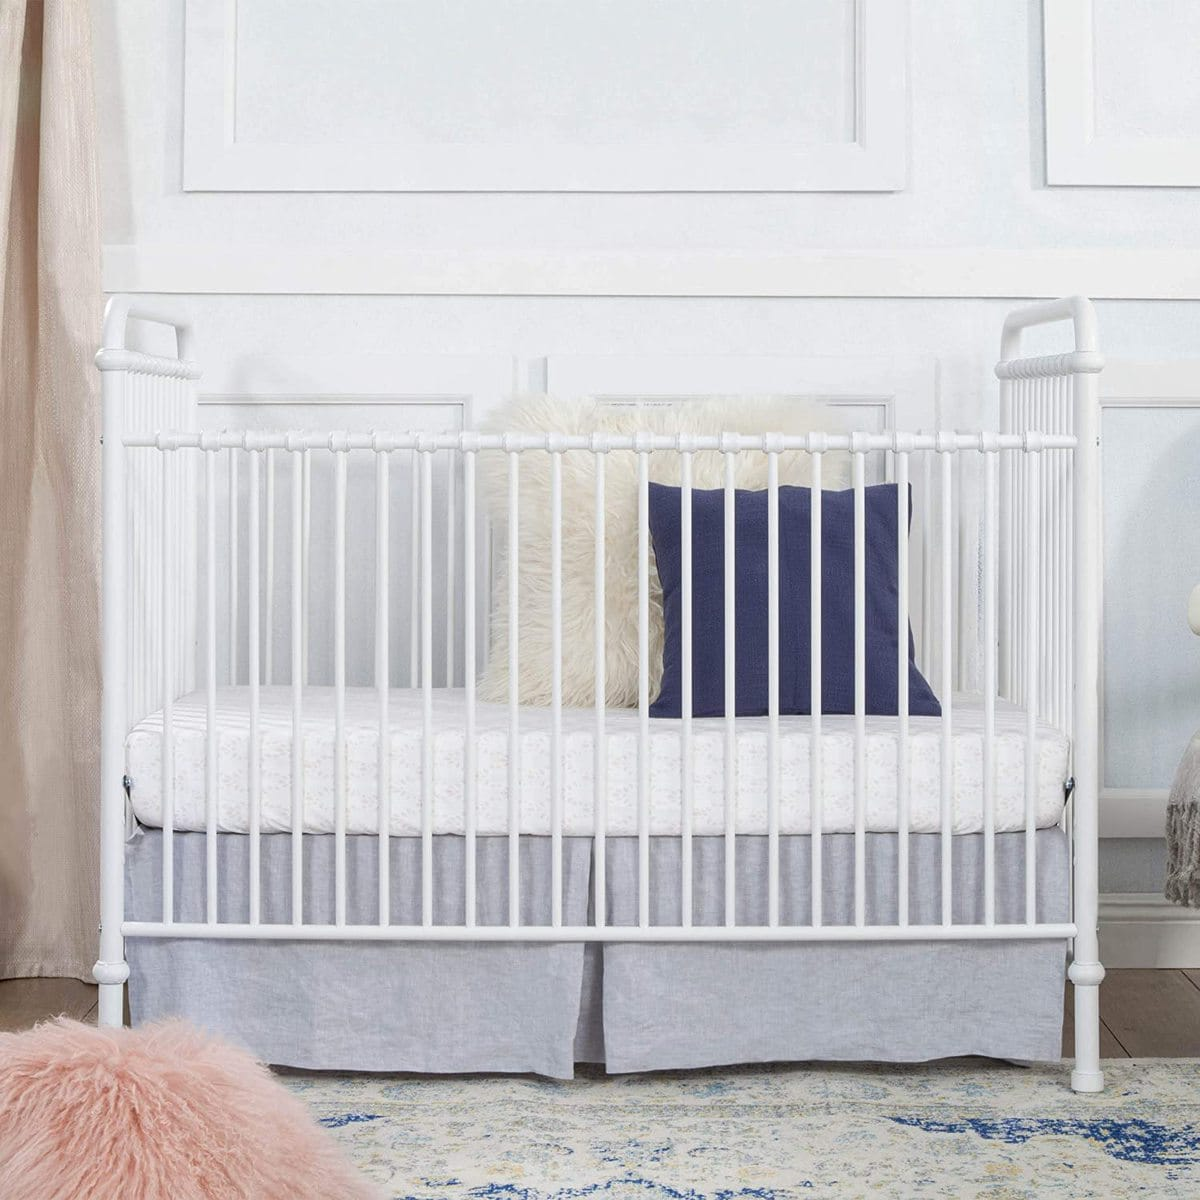 Convertible Iron Crib